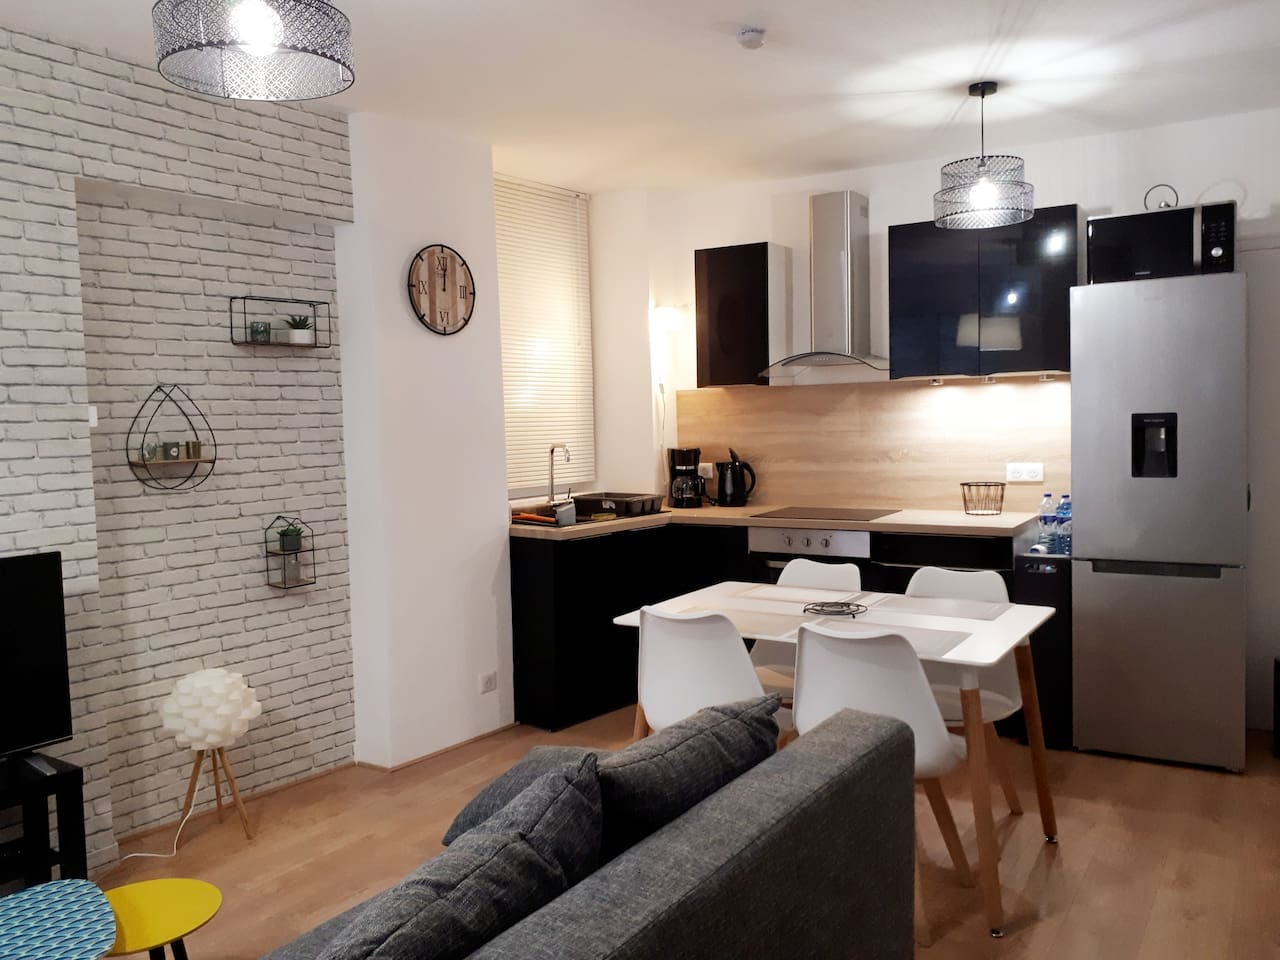 Appartement Cosy au Coeur de Josselin